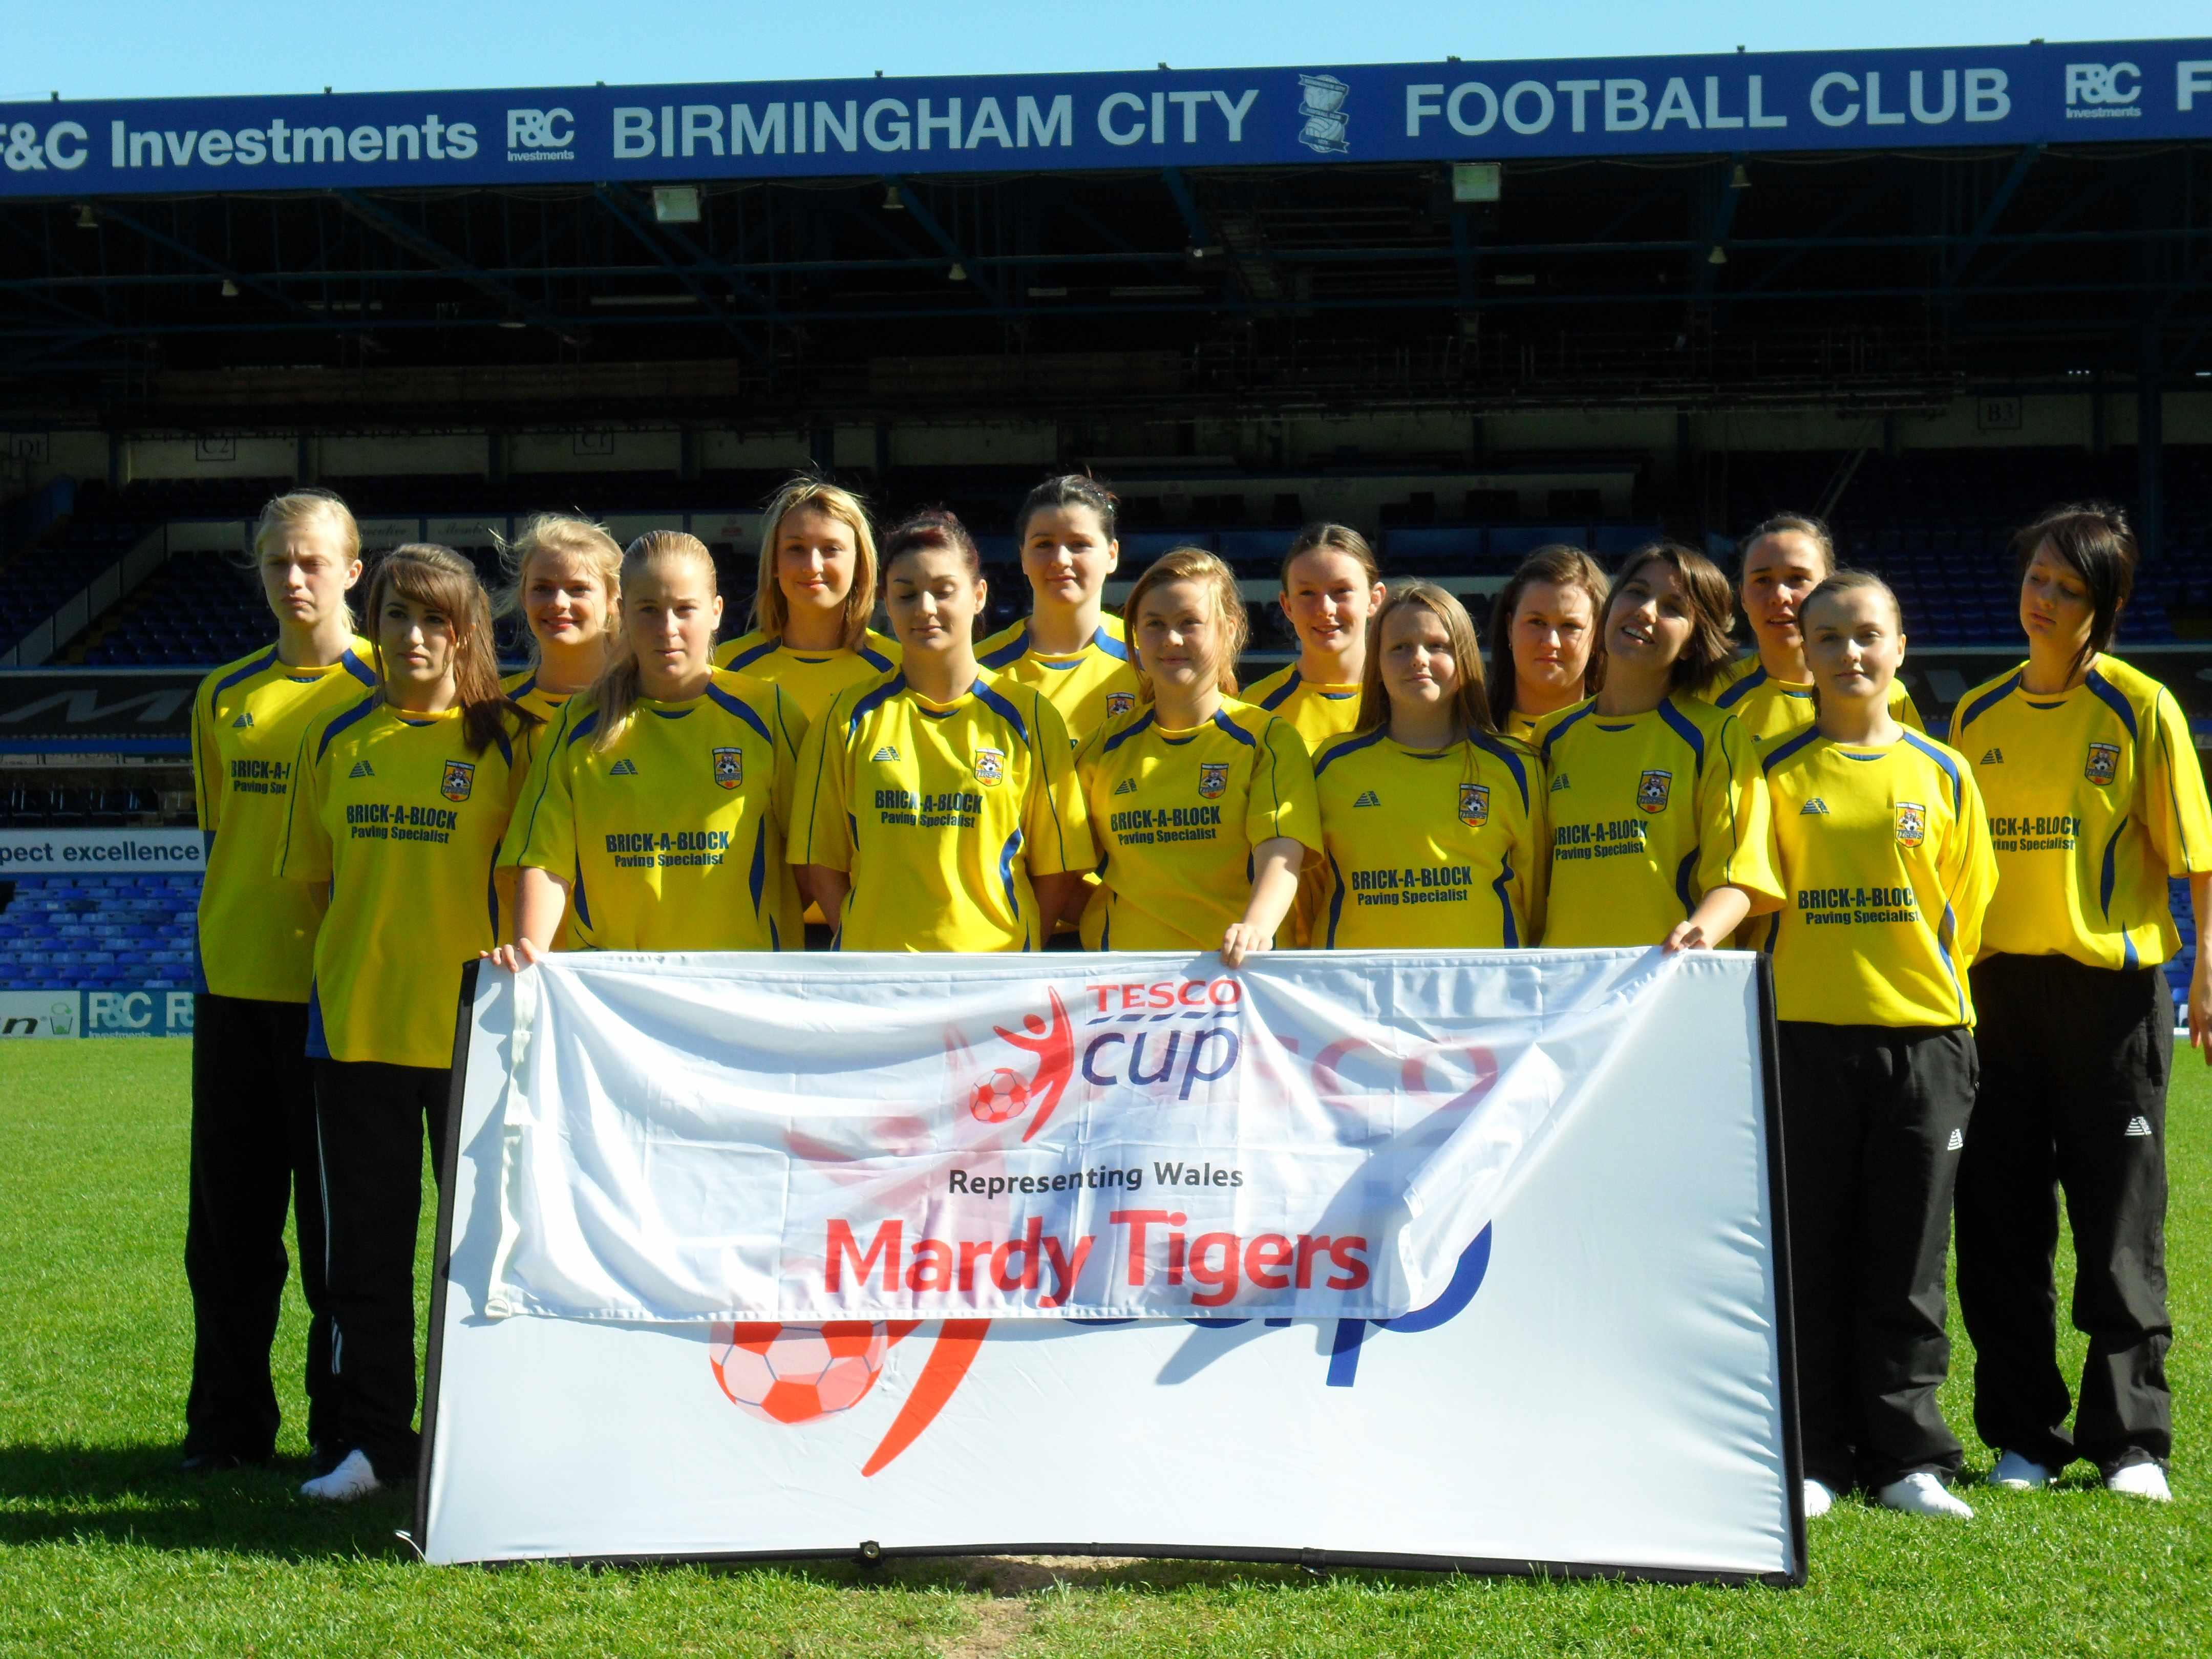 Tigers @ Birmingham